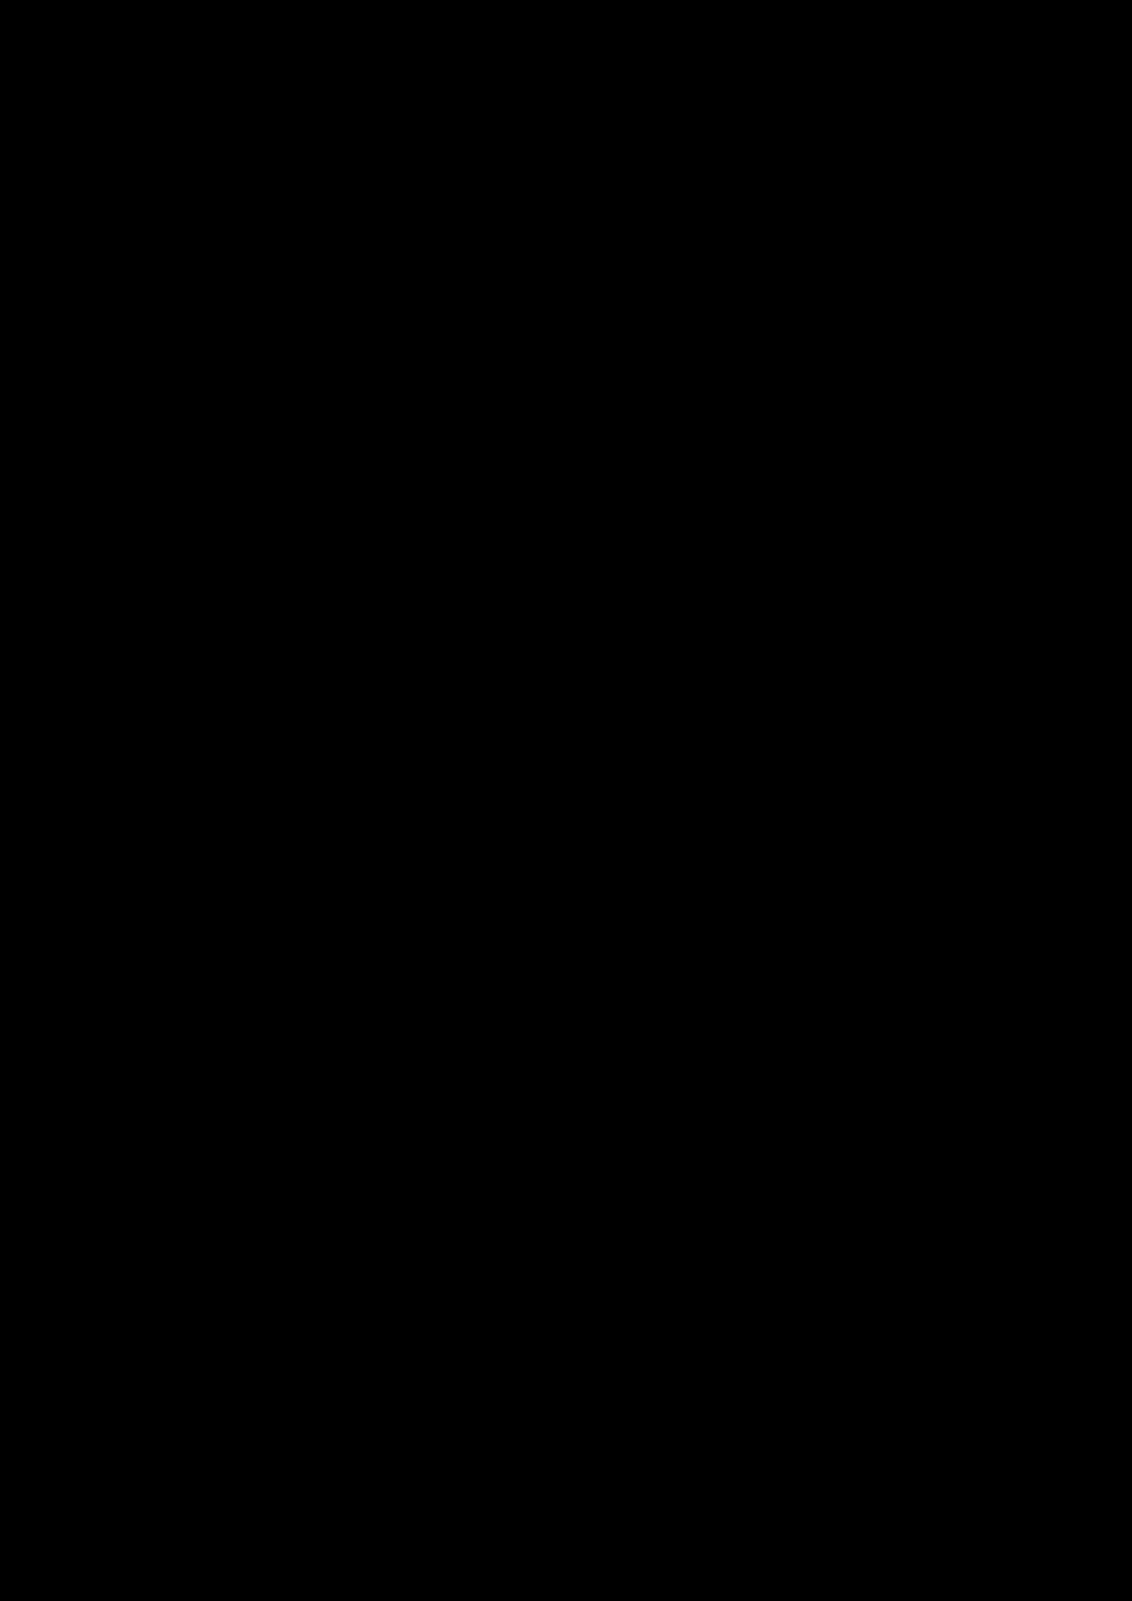 Okean Pustotyi slide, Image 43